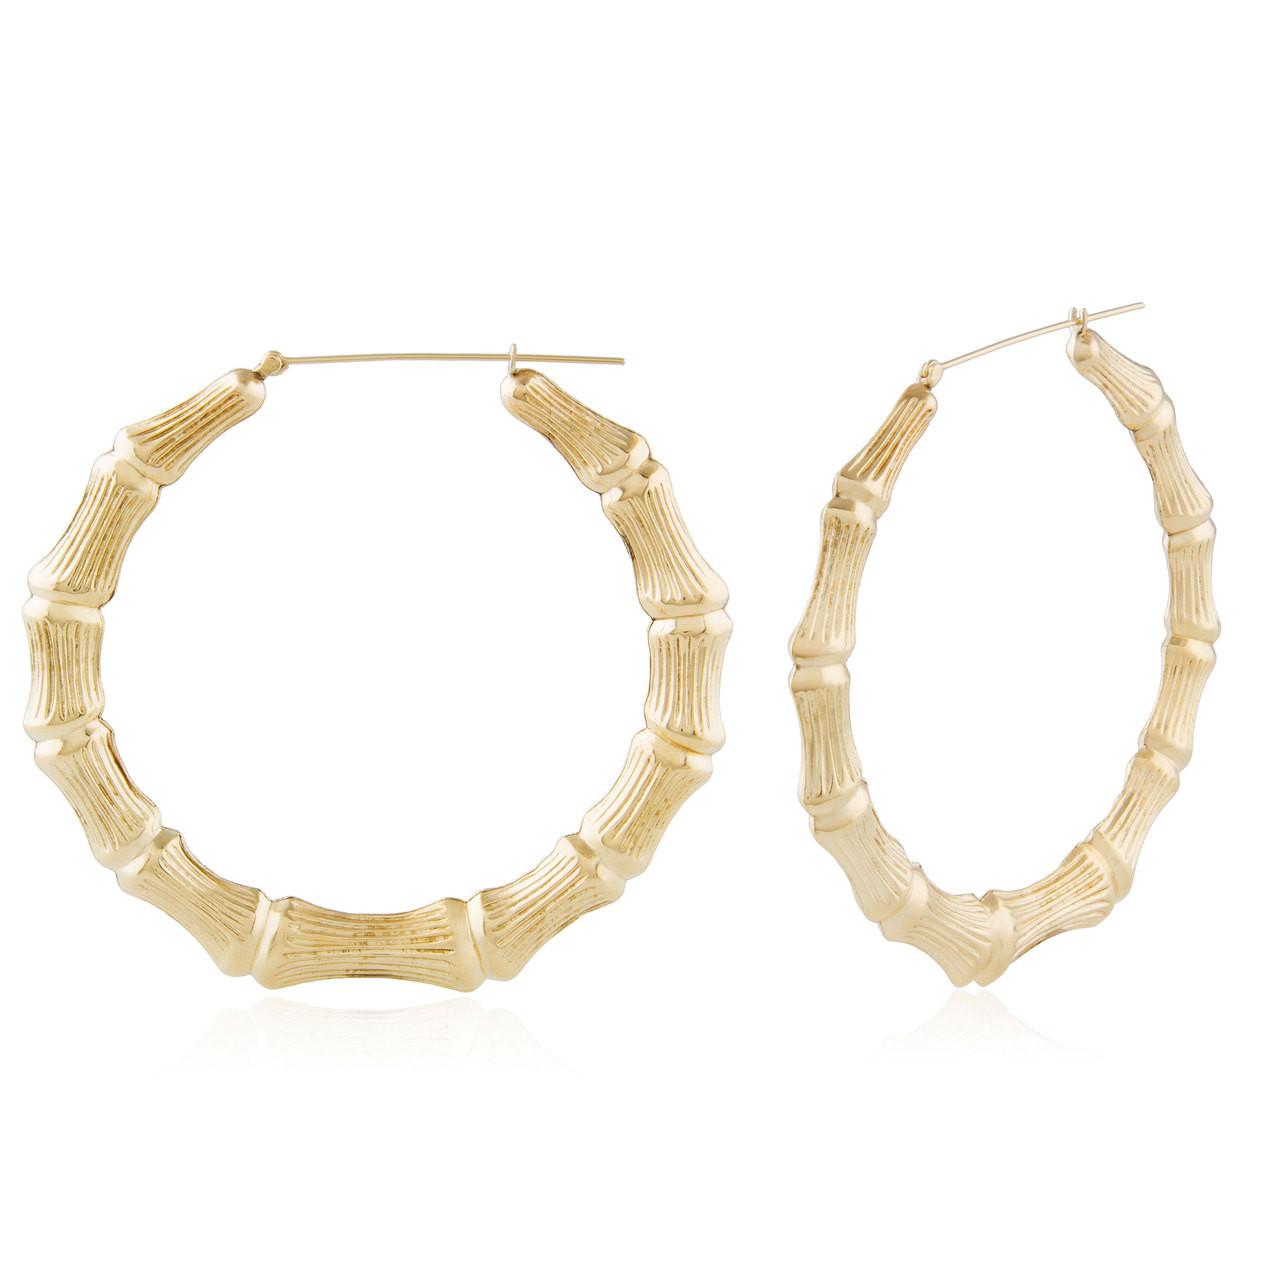 ad2664748 14k Yellow Gold Large Bamboo Hoops - Shyne Jewelers